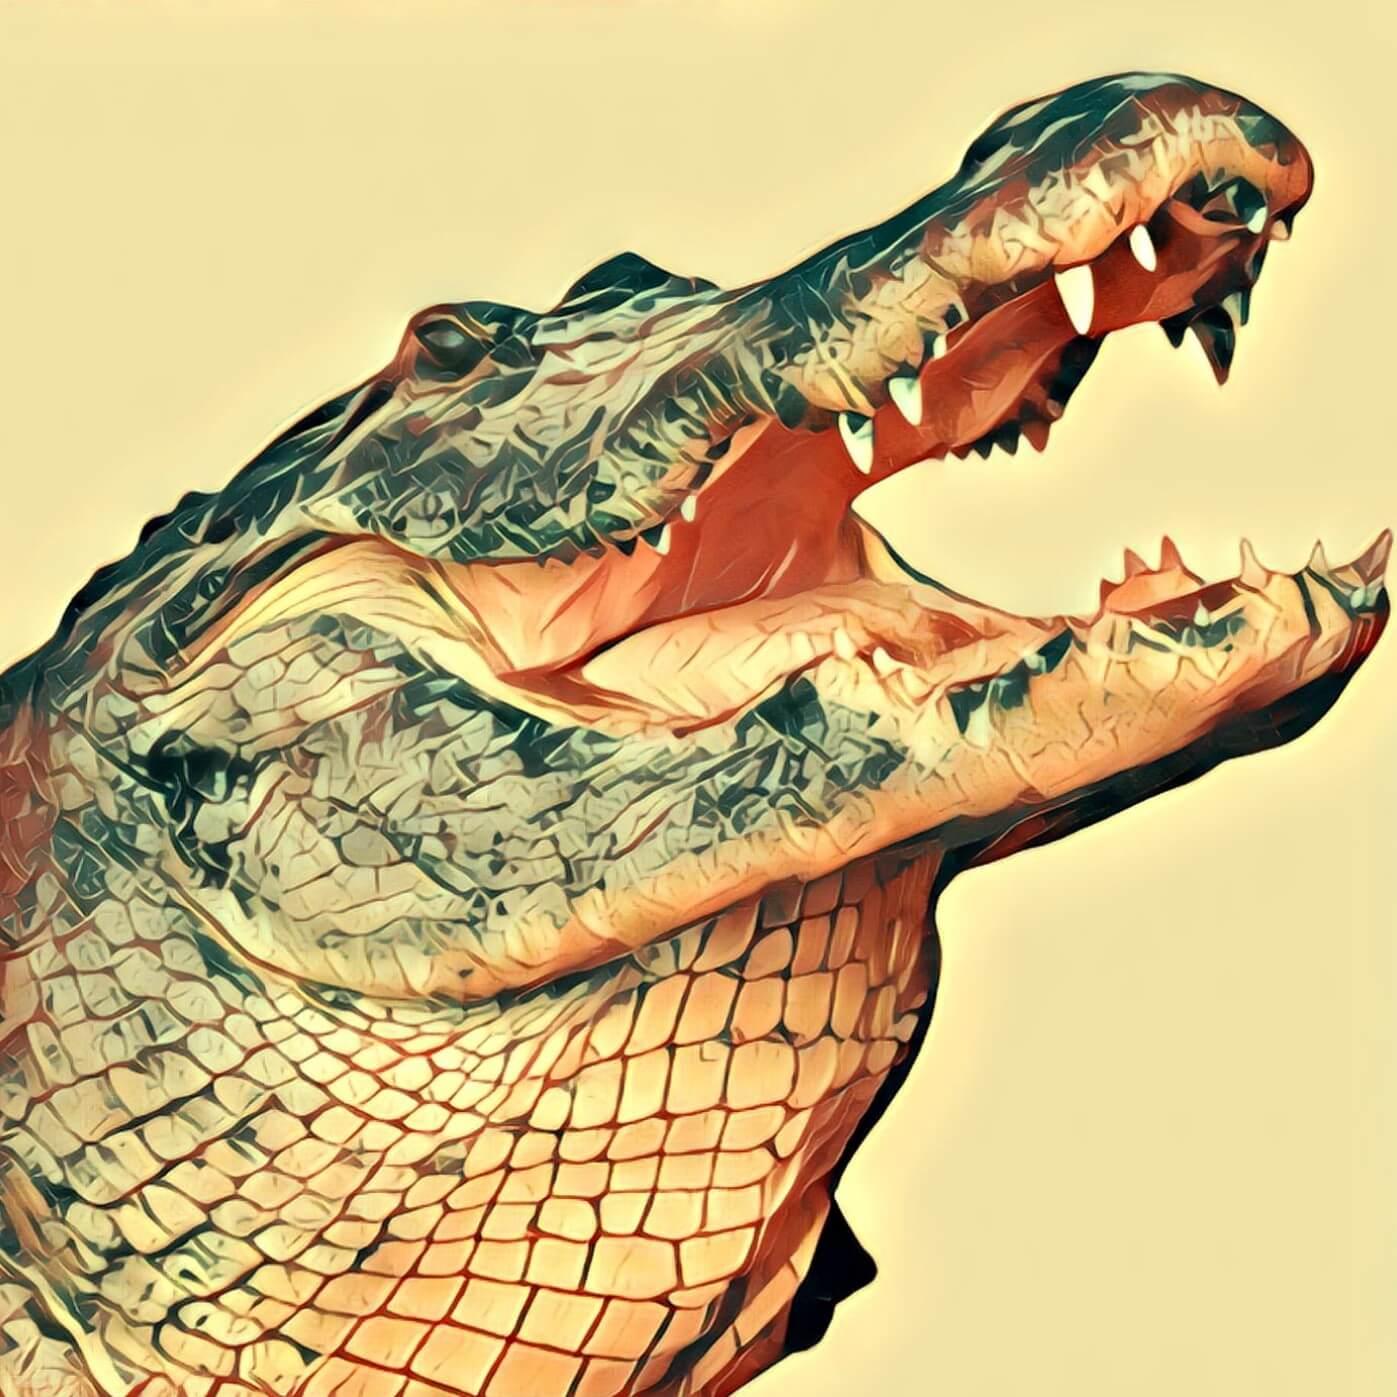 Krokodil Traumdeutung